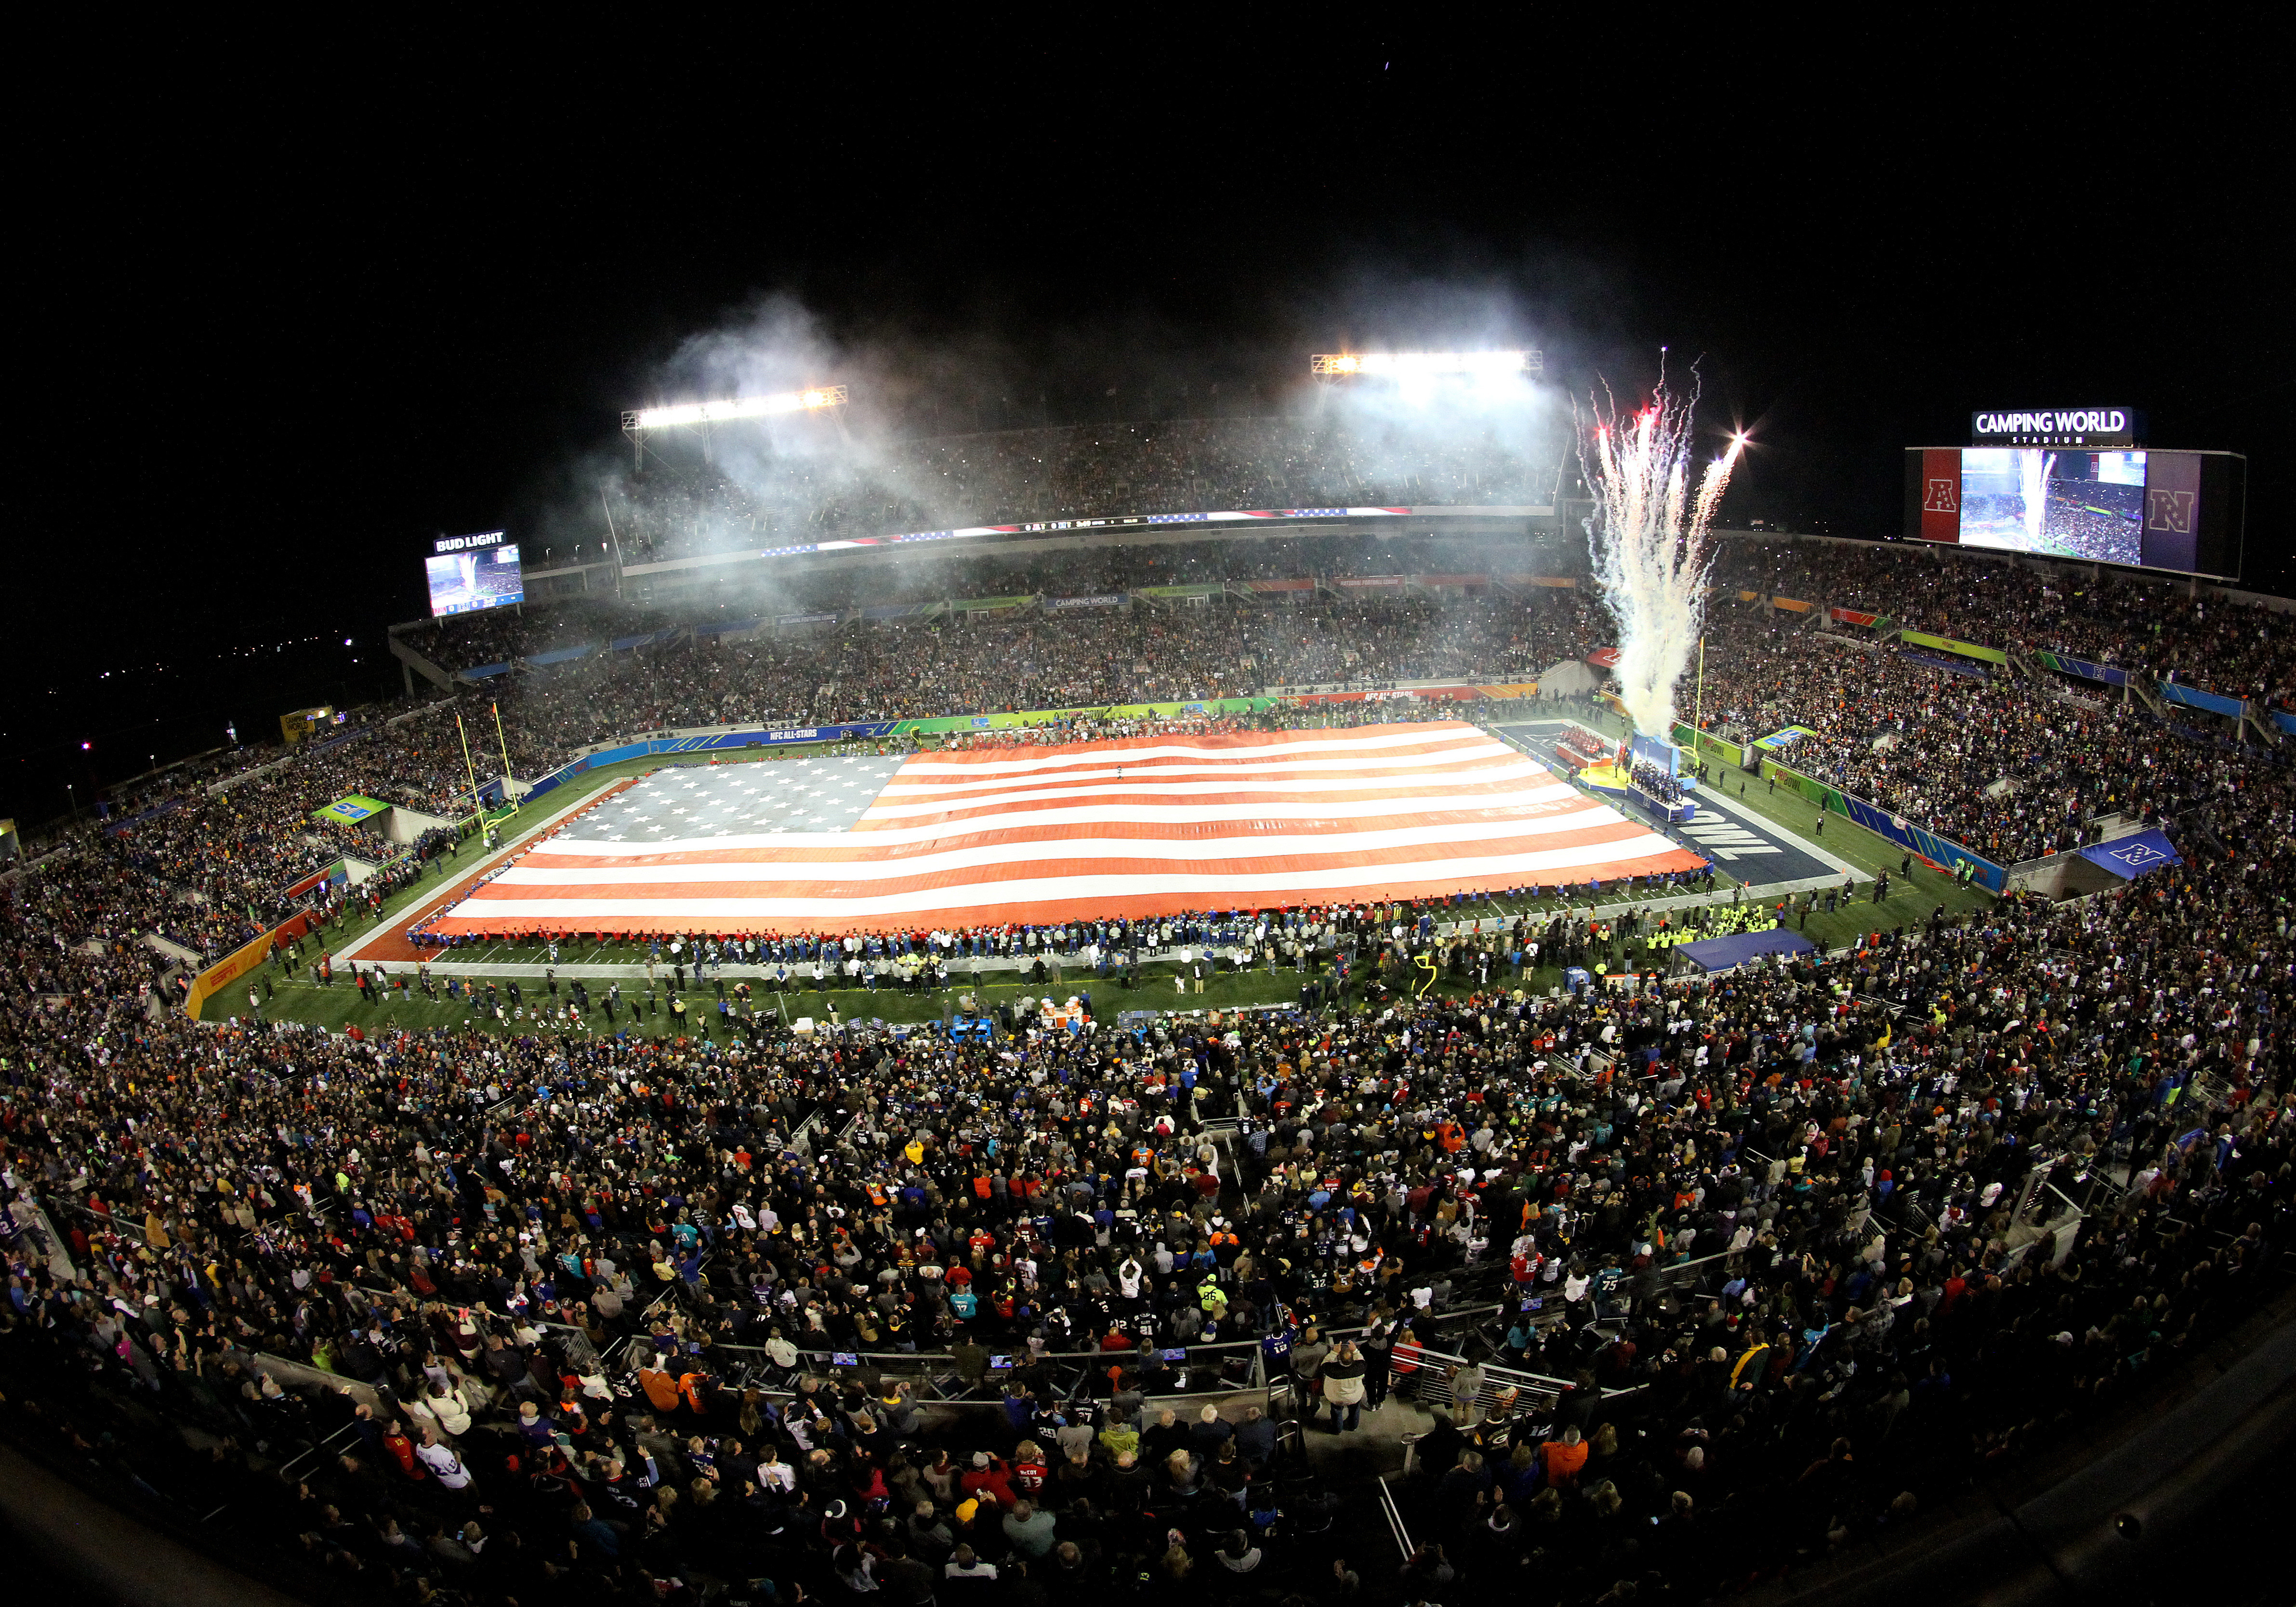 NFL: JAN 29 AFCNFC Pro Bowl